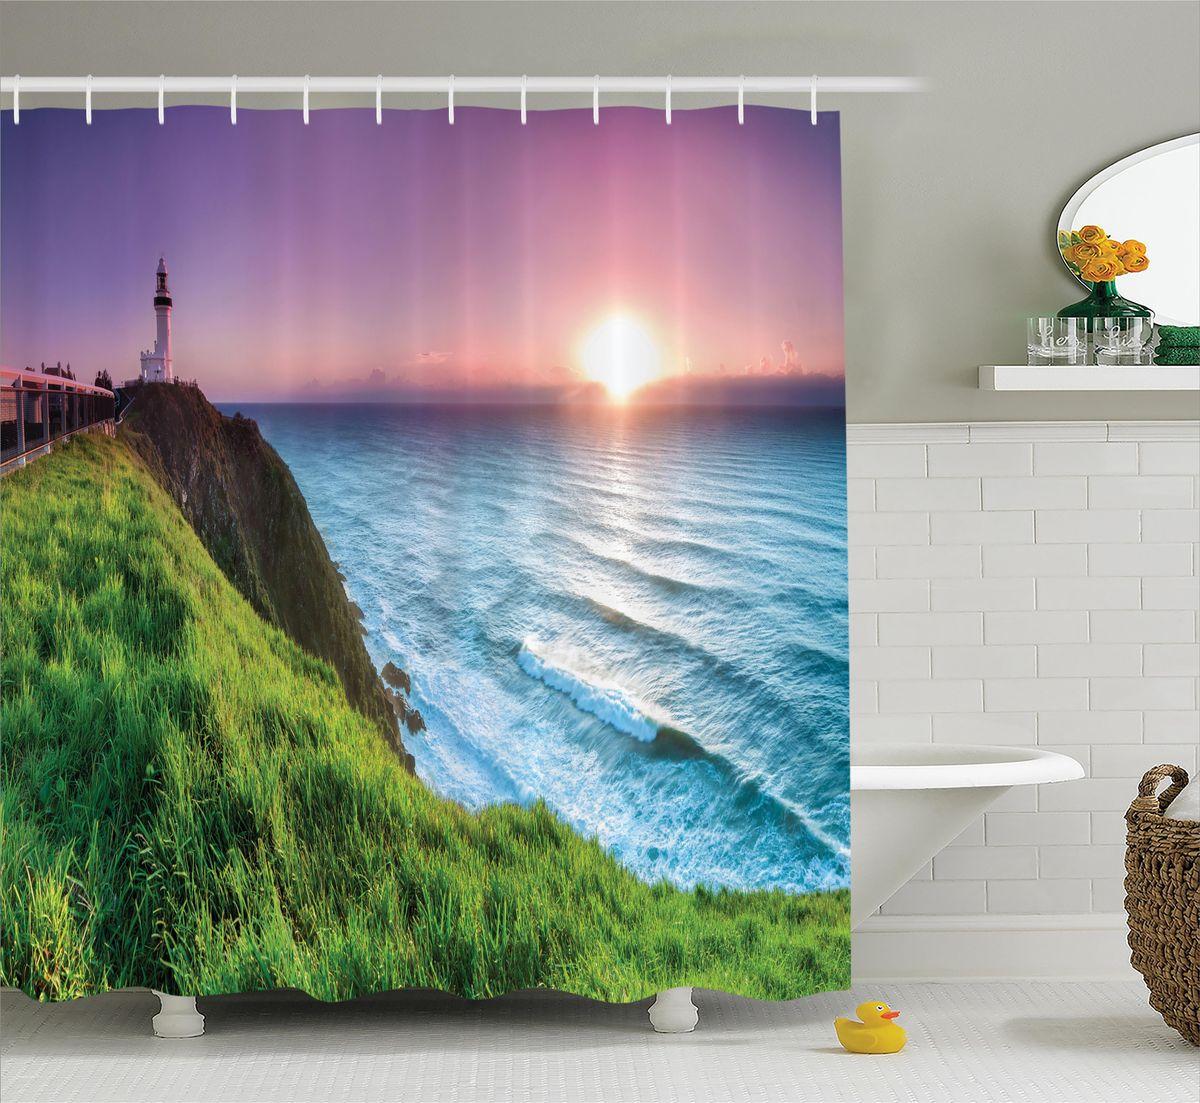 Штора для ванной комнаты Magic Lady Зеленый берег на закате, 180 х 200 см штора для ванной комнаты magic lady абрикос на закате весна 180 х 200 см